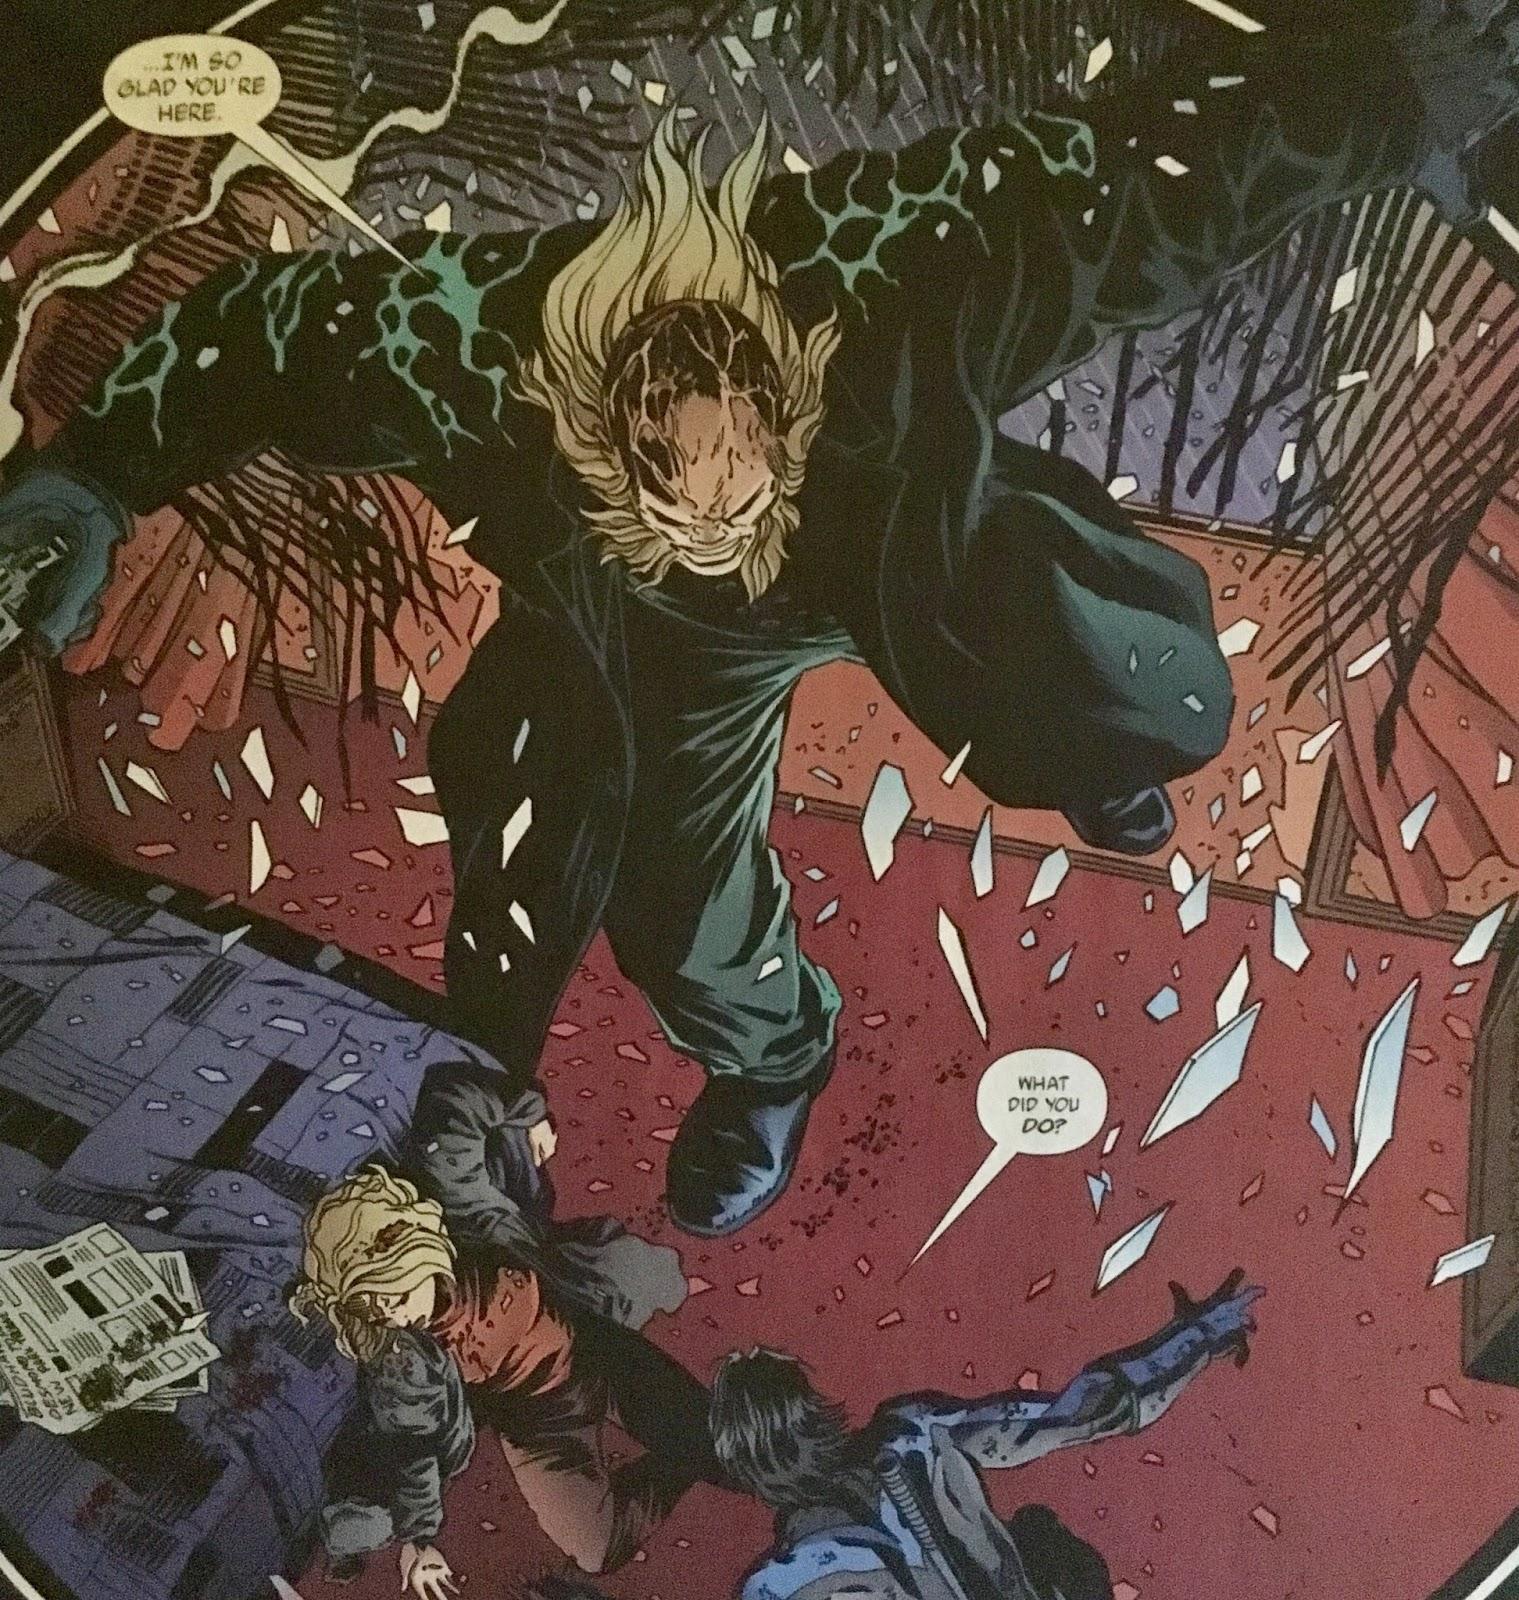 Chris is on Infinite Earths: Nightwing #93 (2004)